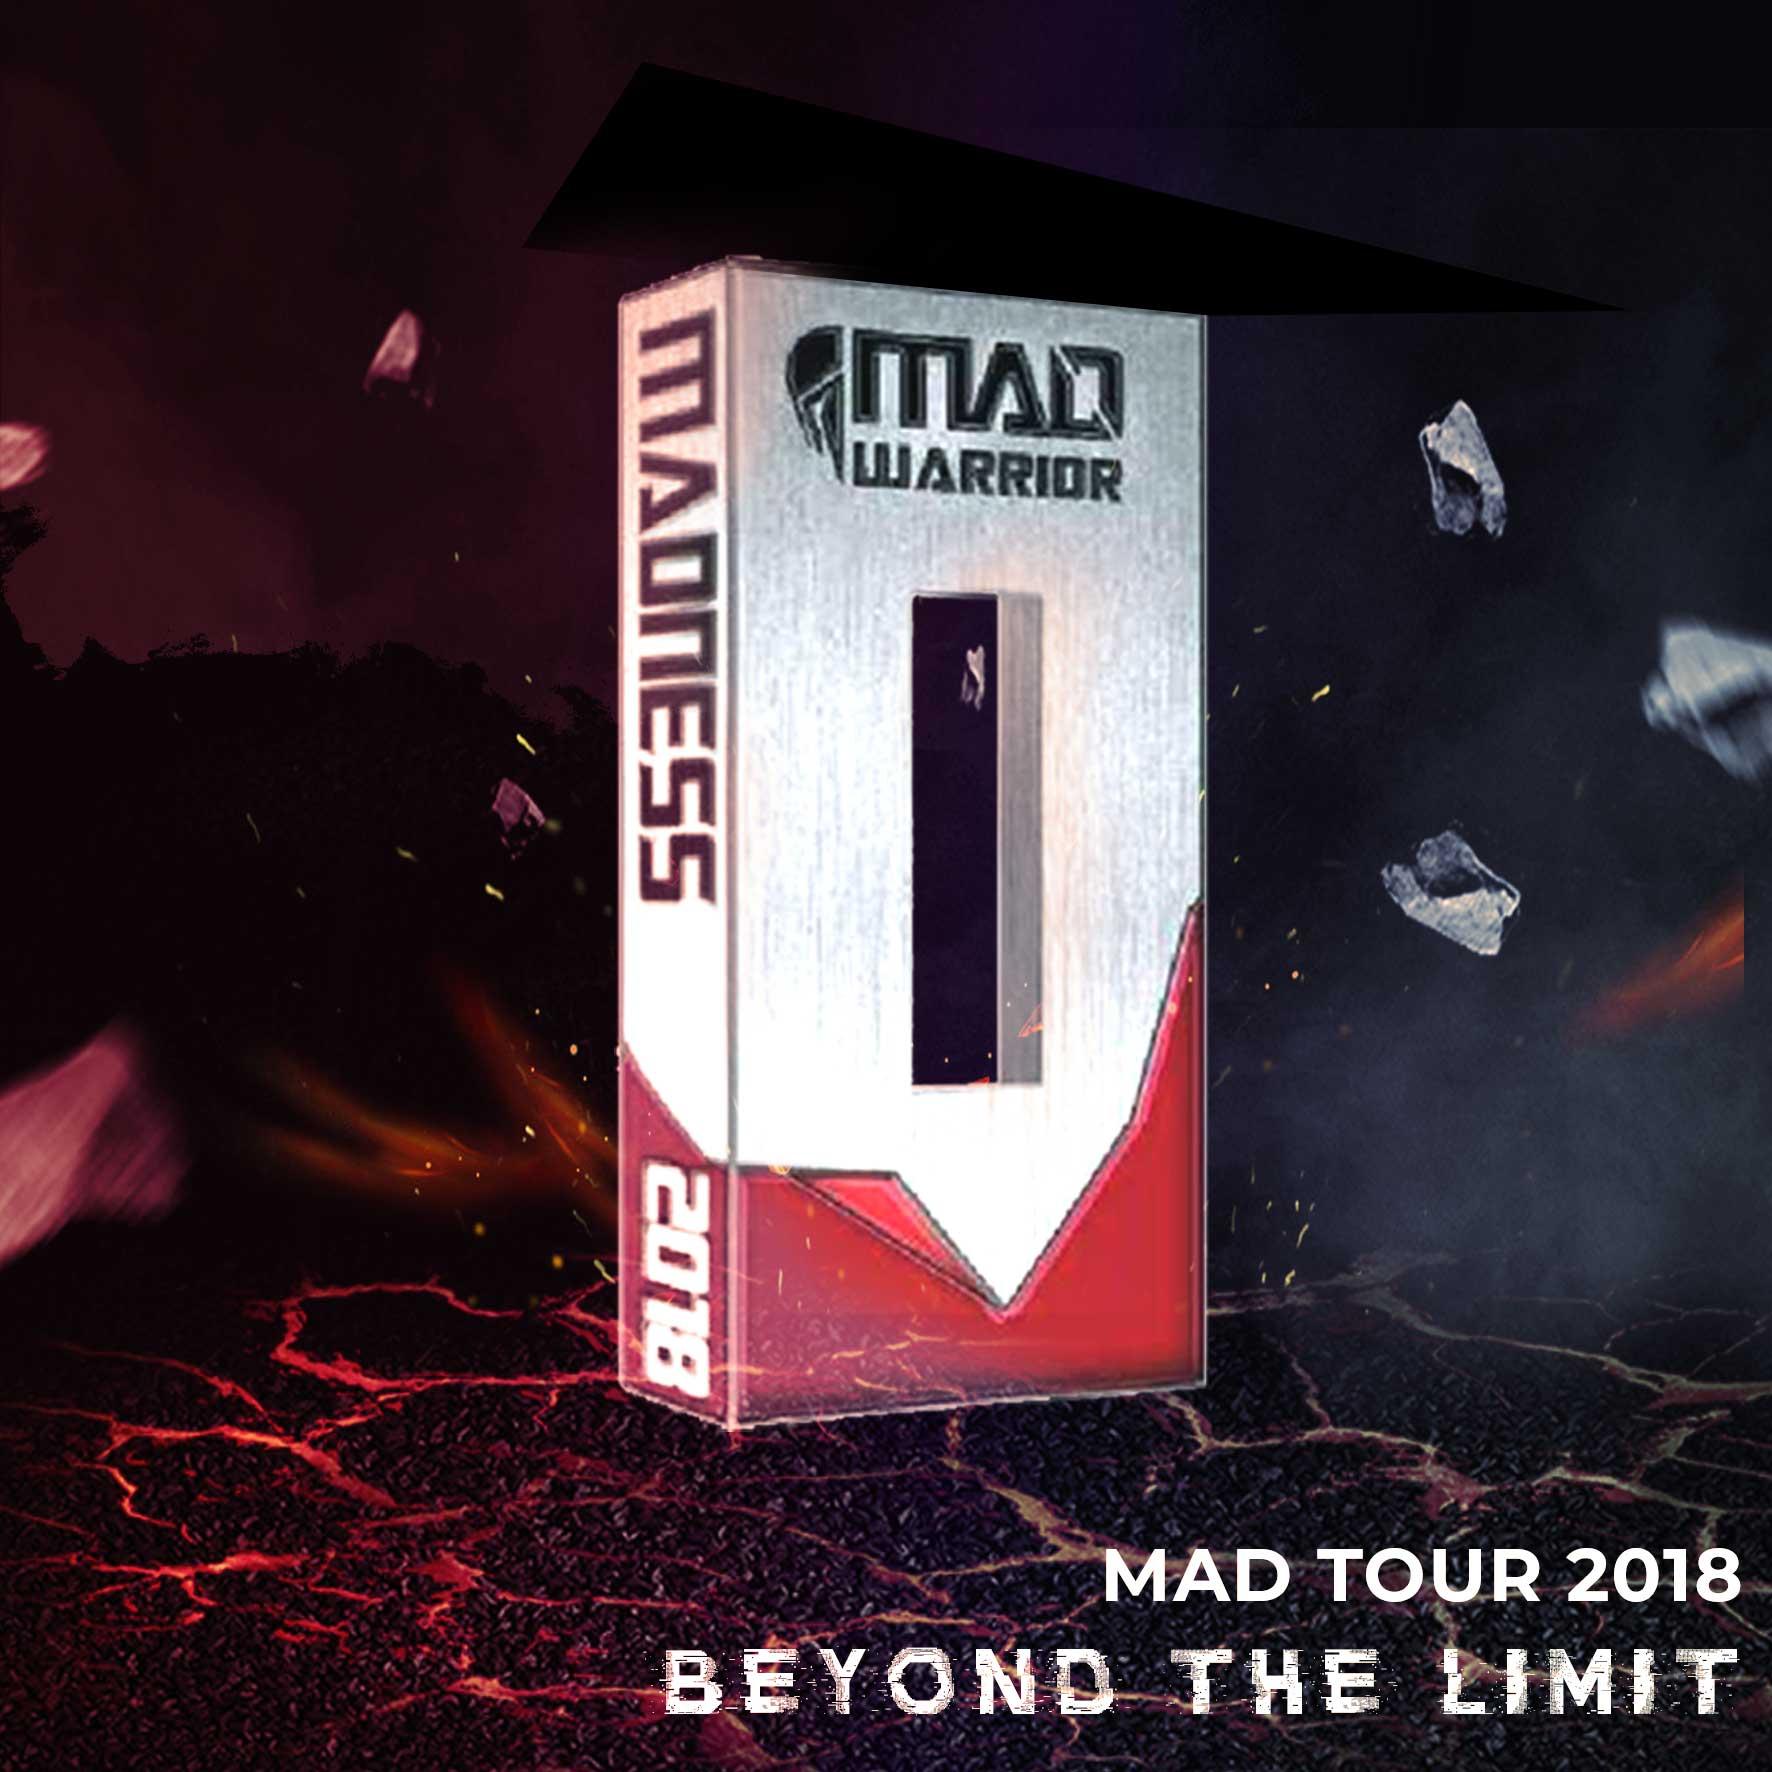 Mad Tour 2018 - Madness